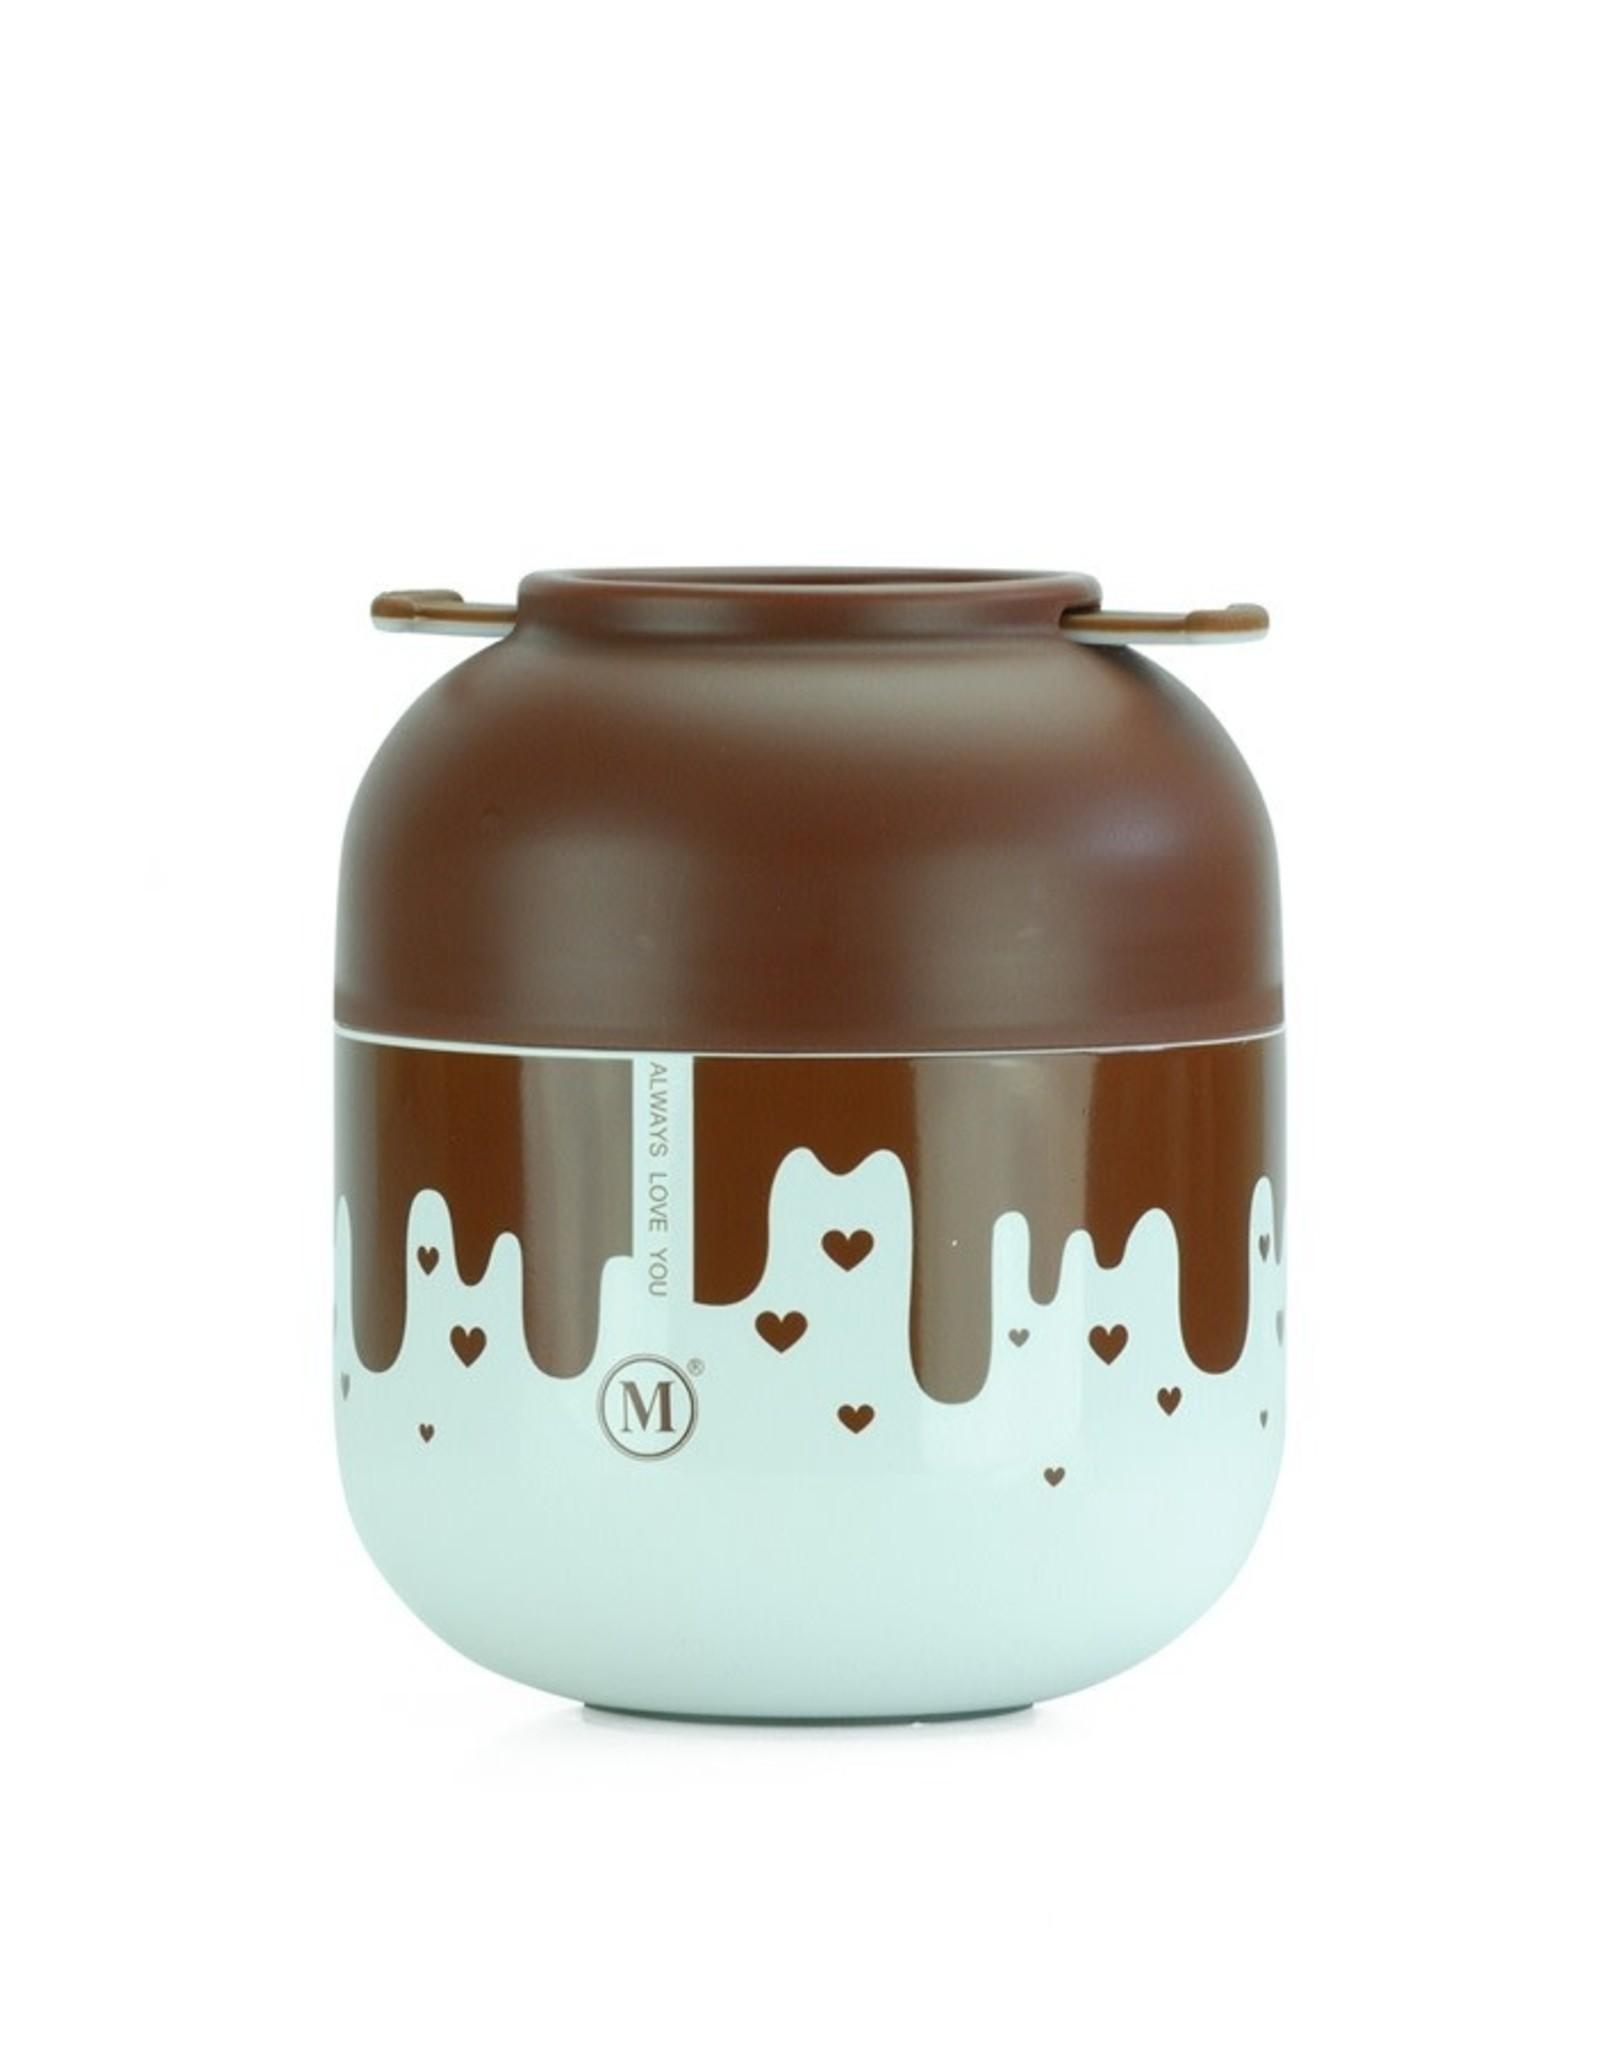 Minimal Nexten Minimal Insulated Food Jar V2 500mL - Chocolate